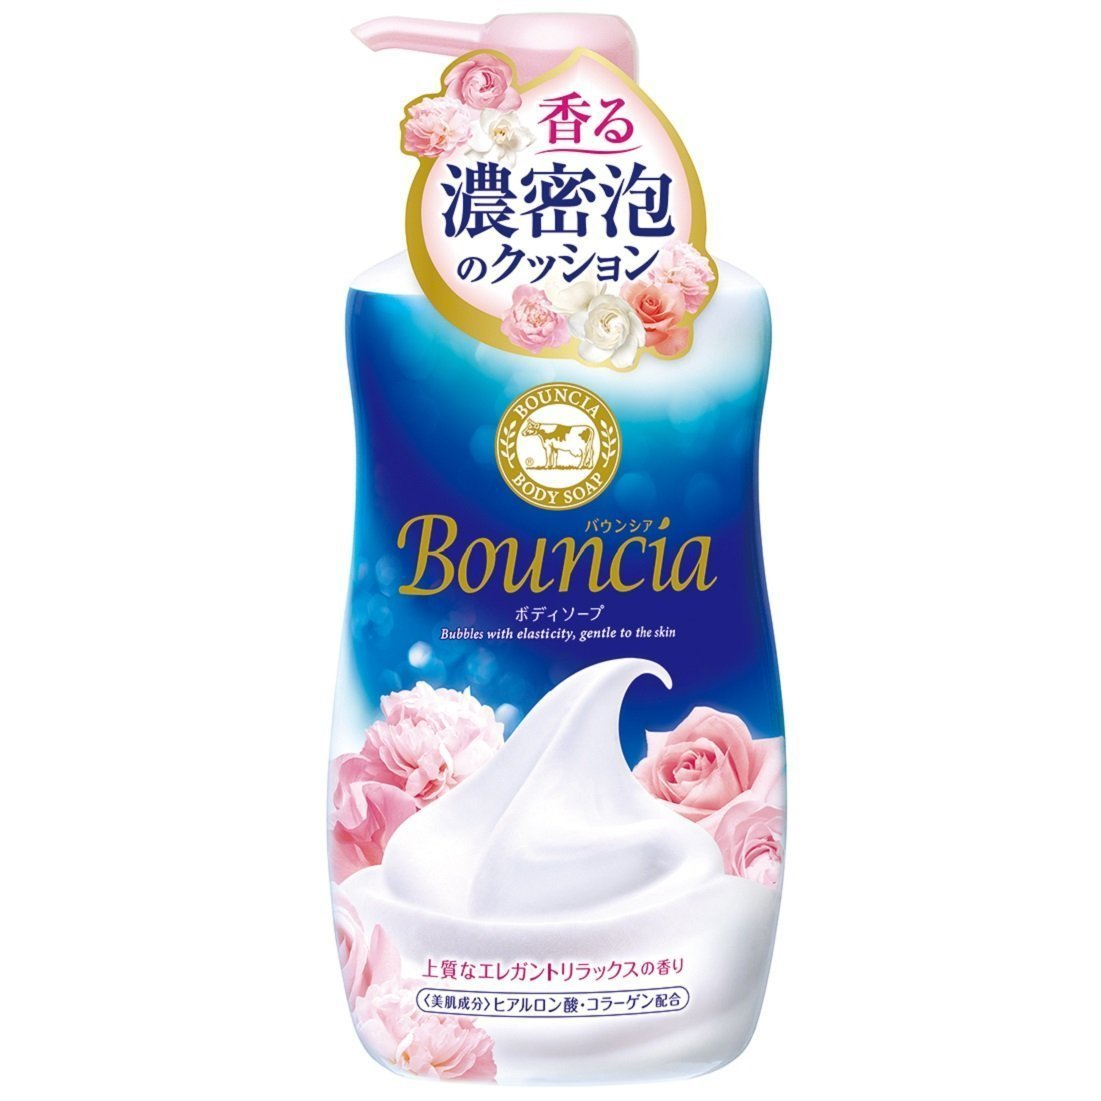 Bouncia Body Soap Feminine Bouquet